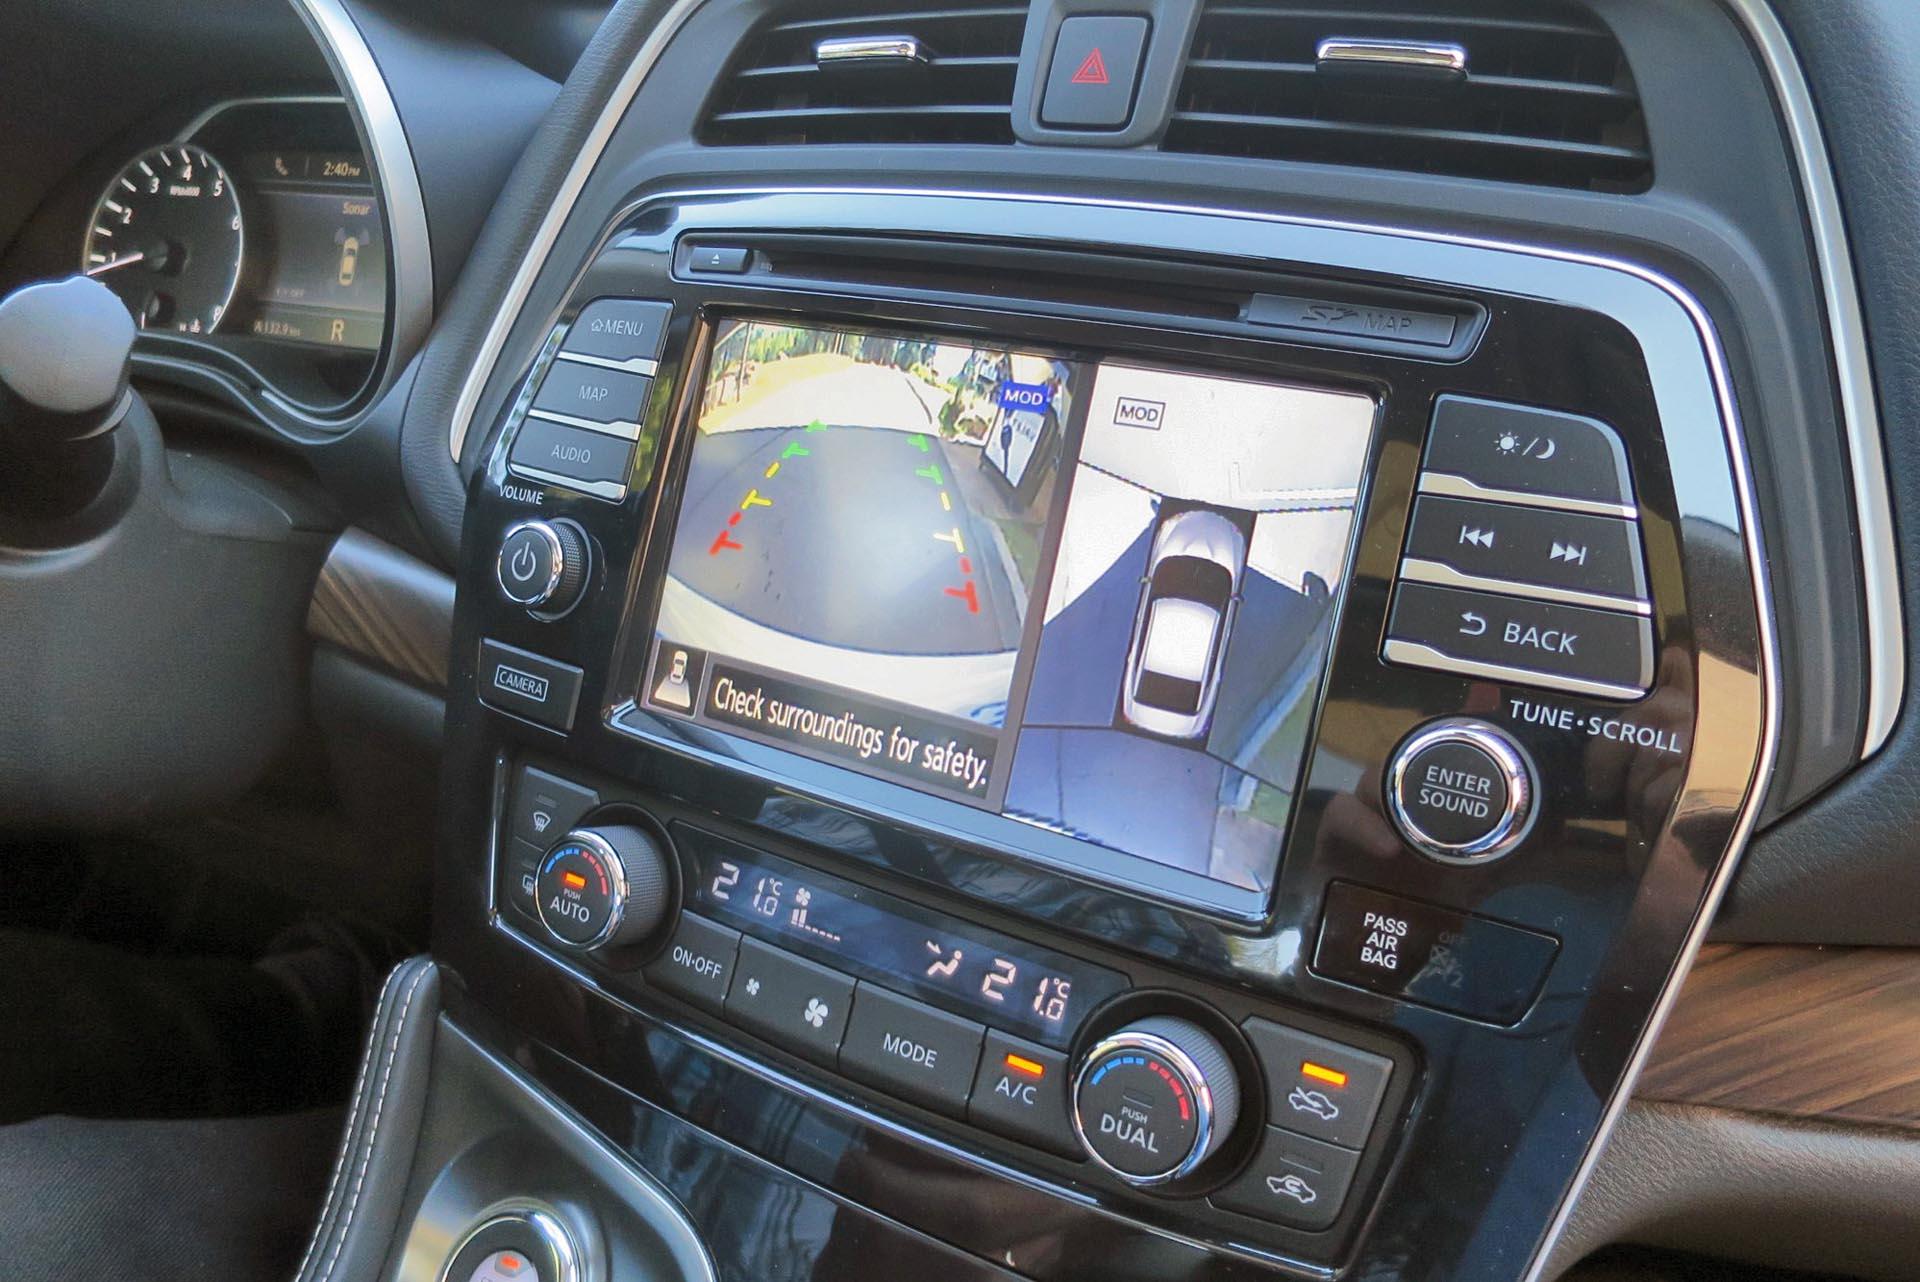 http://www.autos.ca/wp-content/uploads/2015/07/2016-Nissan-Maxima-SR-PW-11.jpg